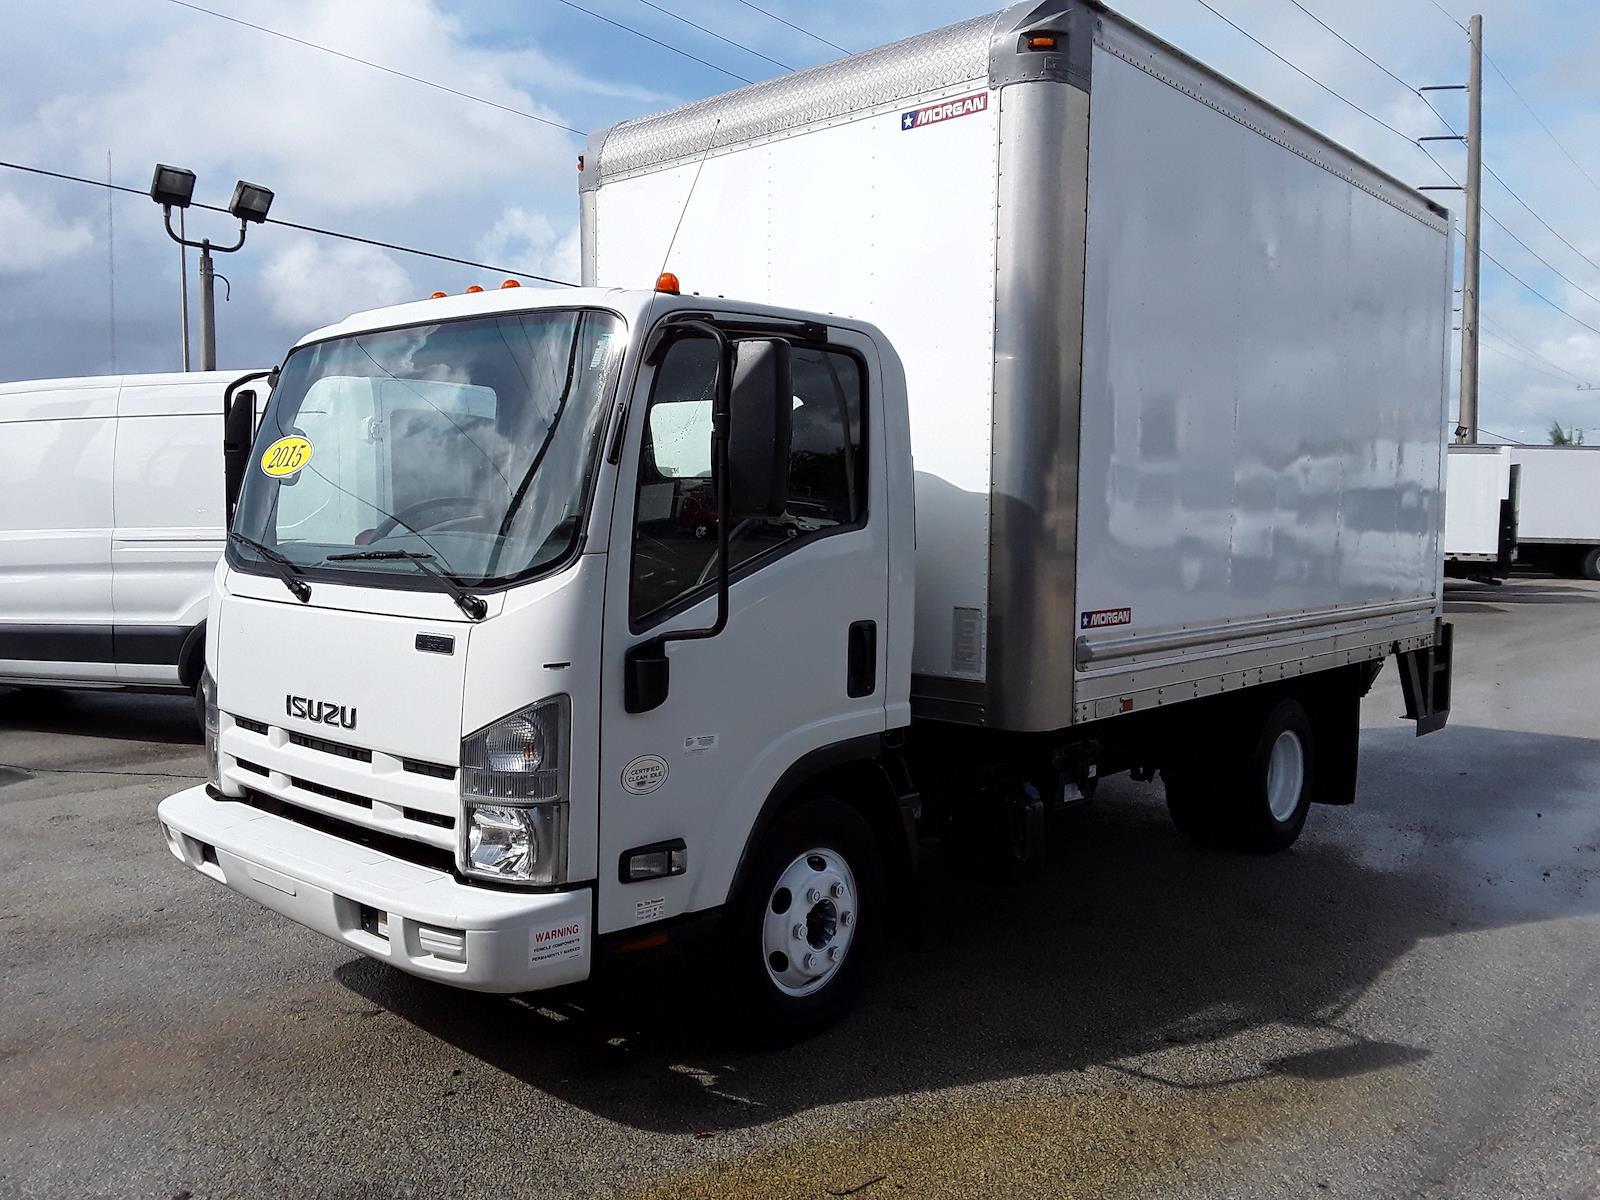 2015 Isuzu NPR-HD Regular Cab 4x2, Dry Freight #642667 - photo 1